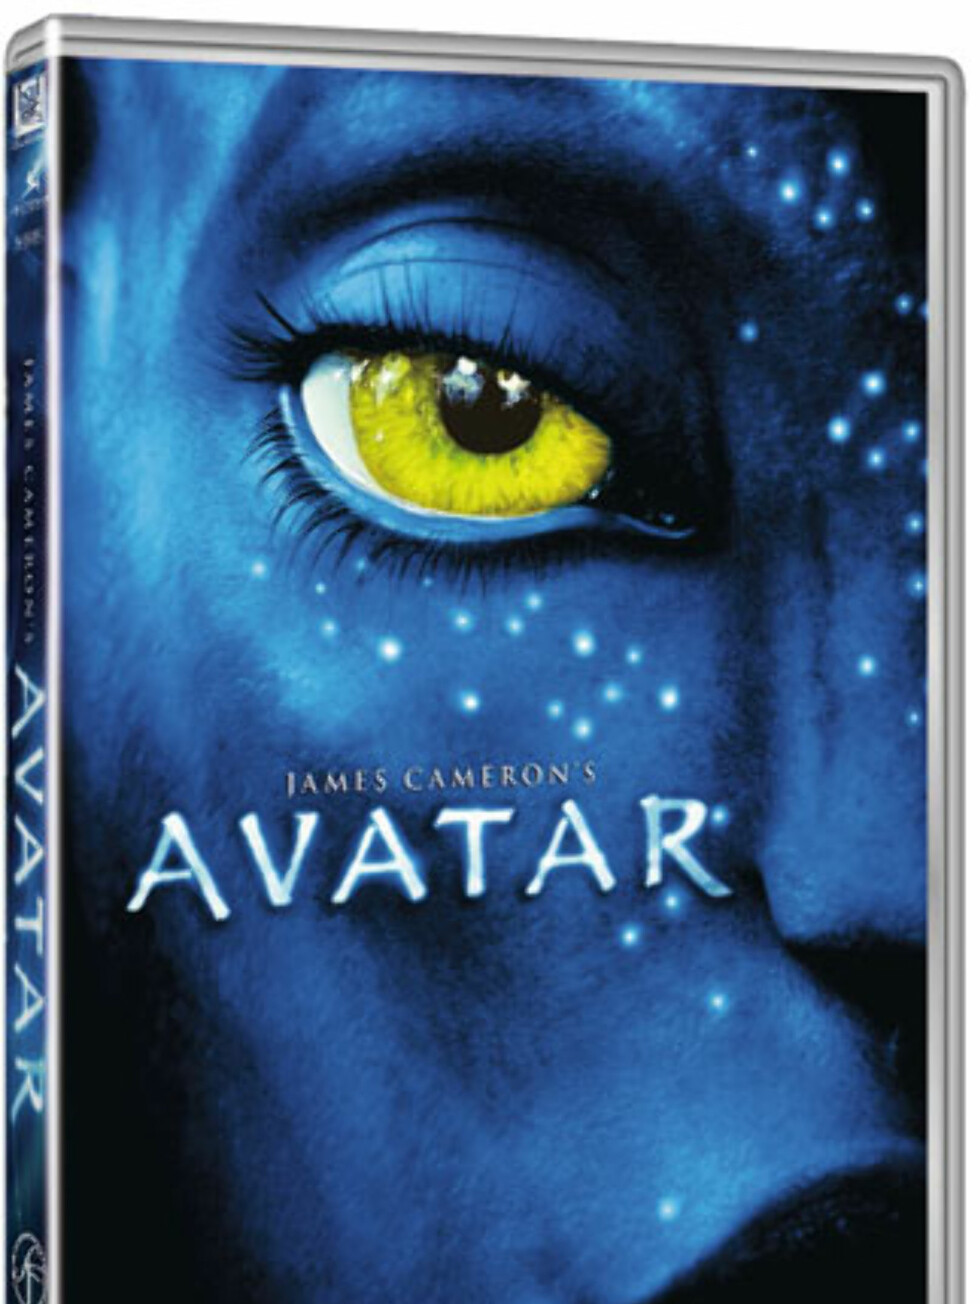 DVD-coveret Foto: Produktbilde/Copyright 20th Century Fox